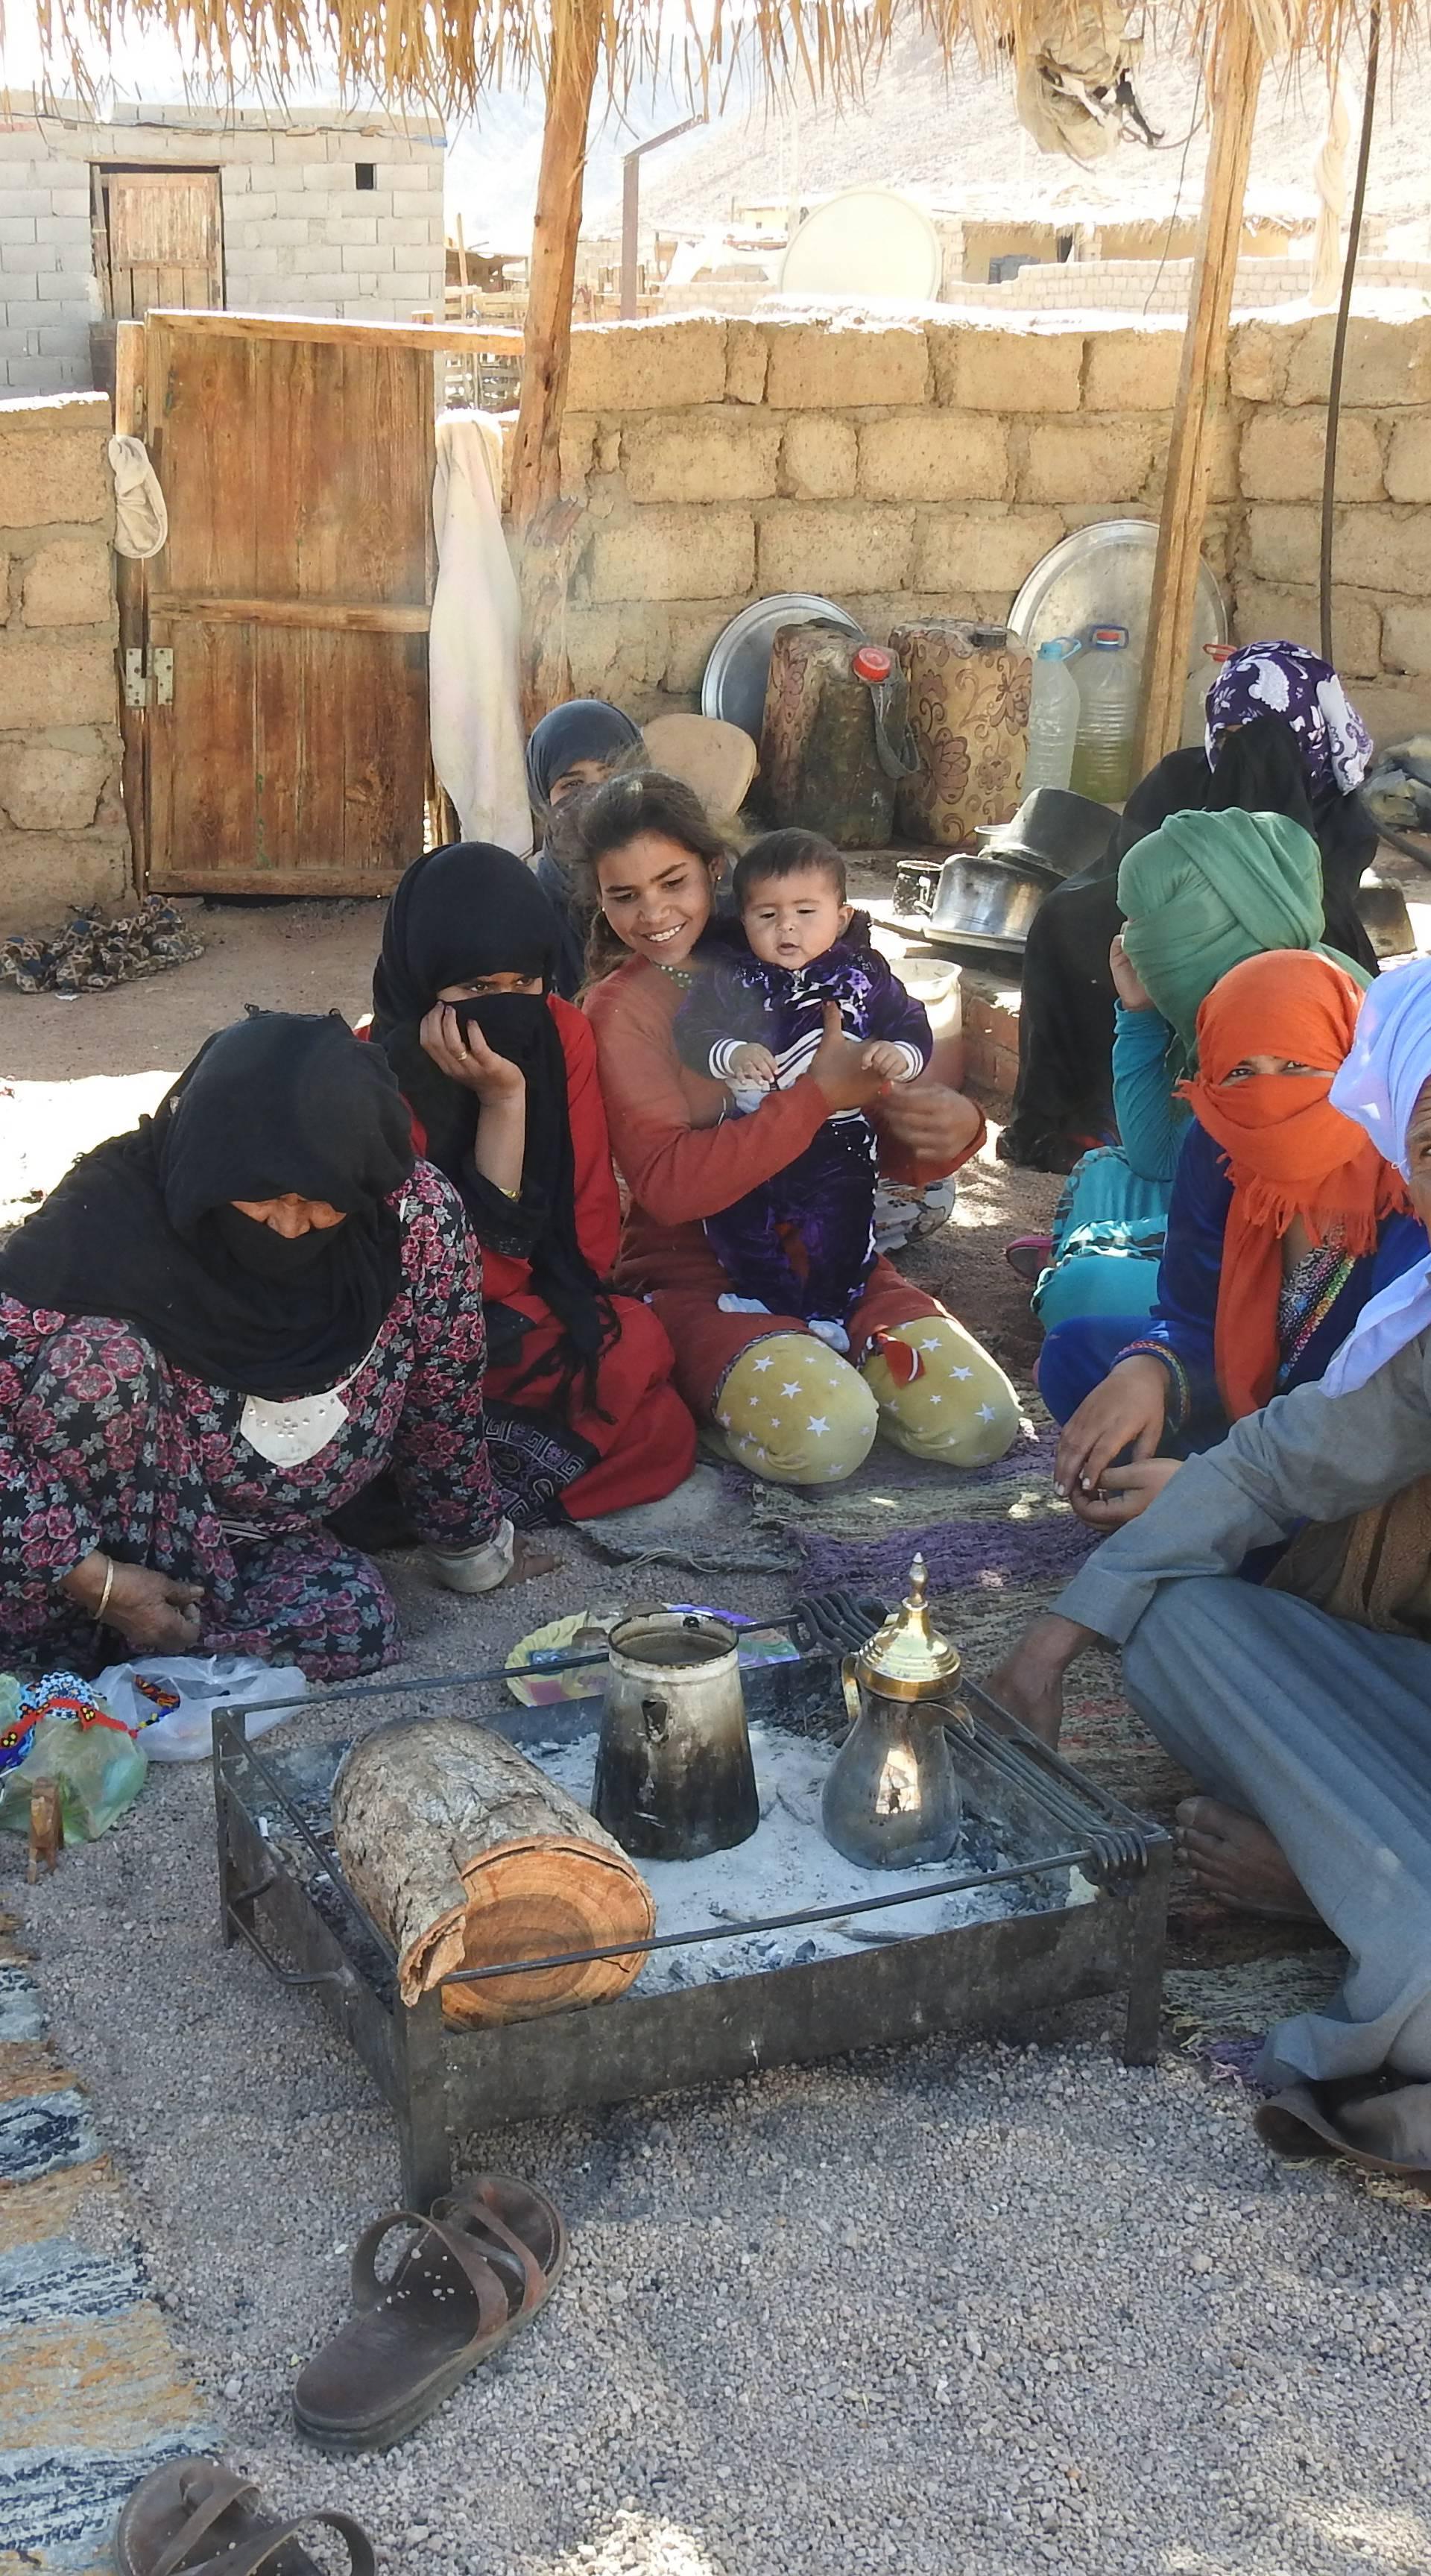 Novinar 24sata: Beduin me u pustinji htio za svojega zeta...